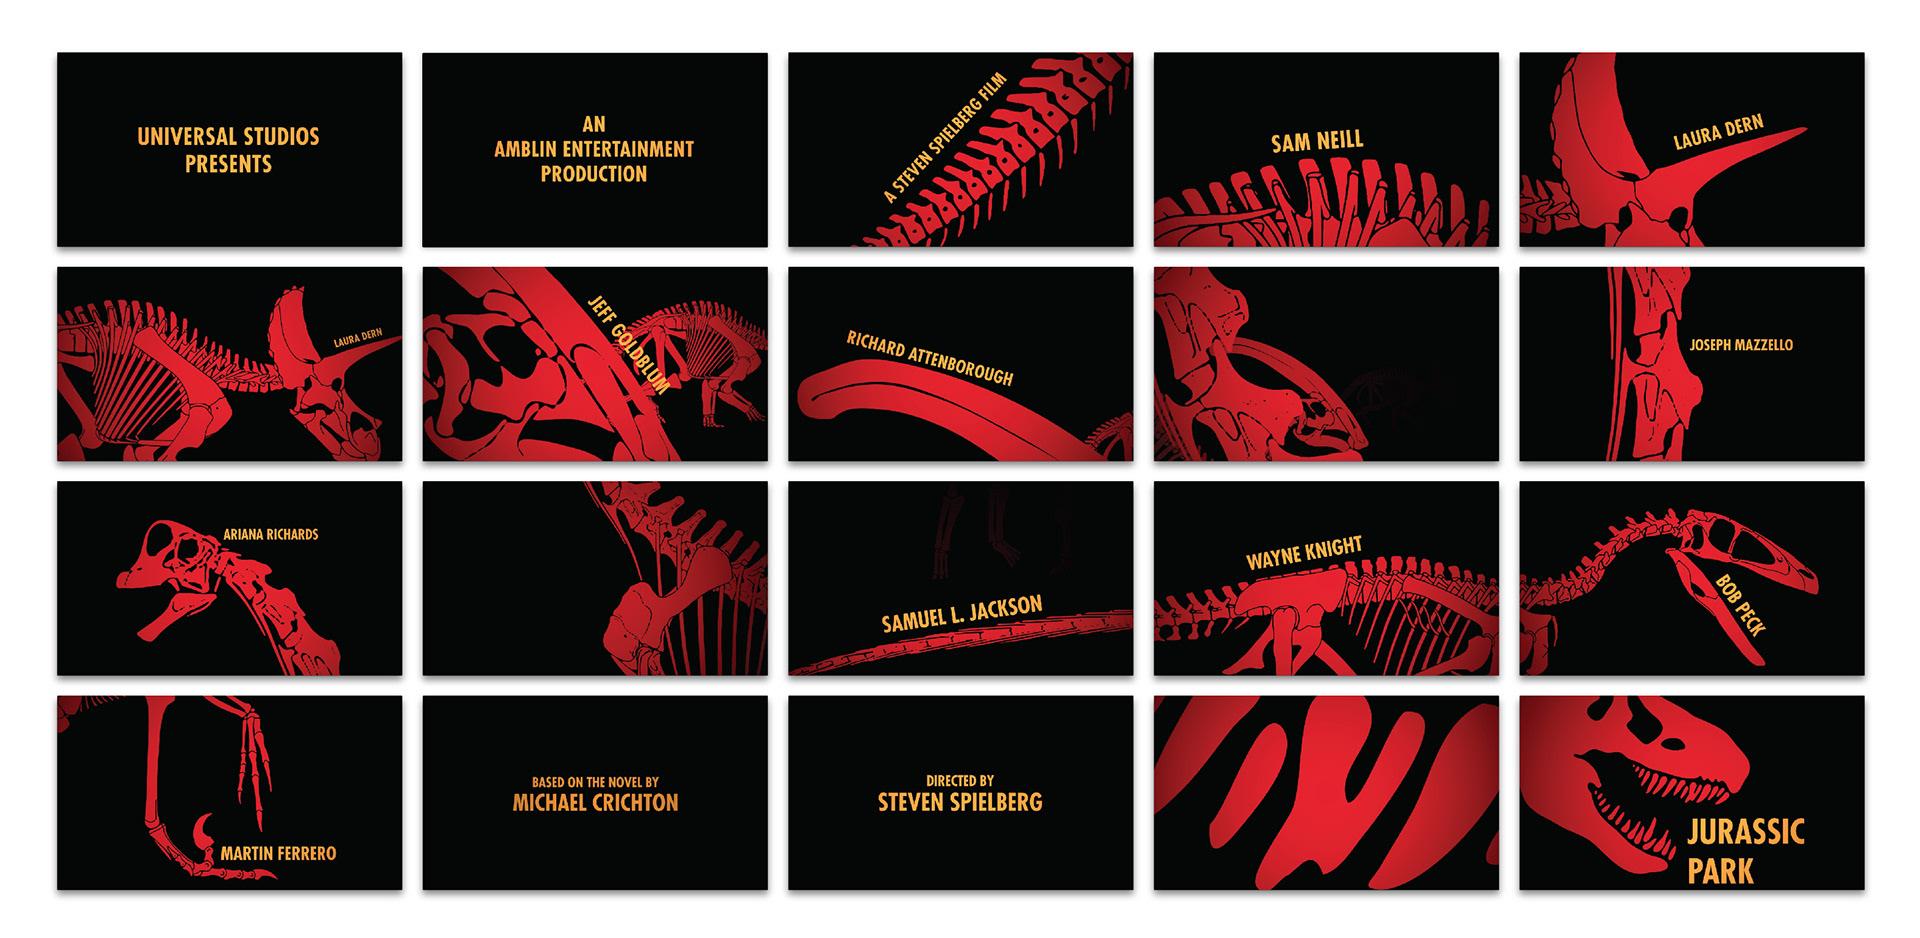 Jurassic Park Poster Credits